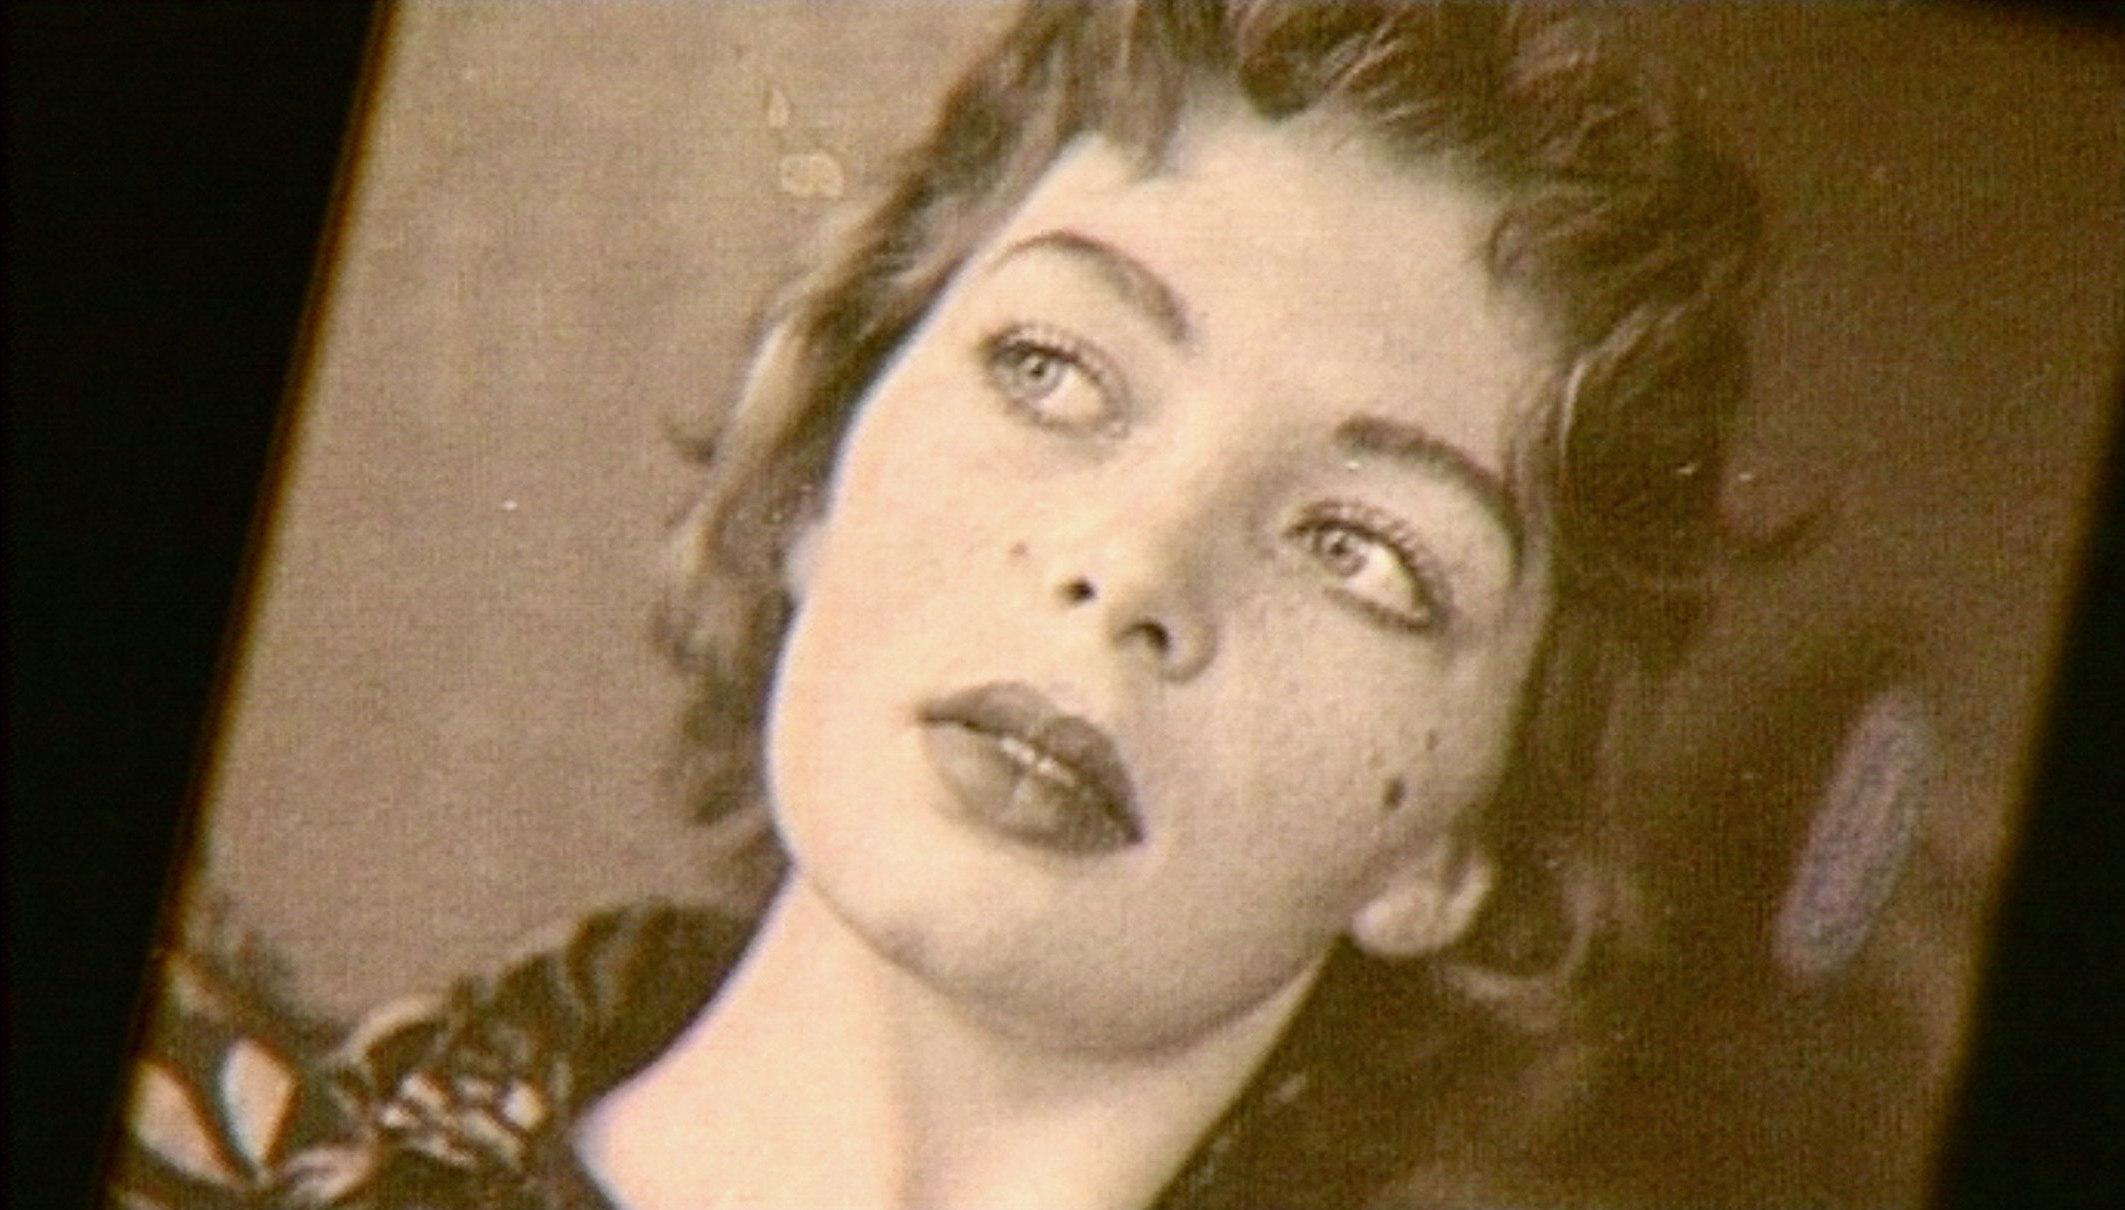 Nico Icon - Foto im Monroe-Style - Regie Susanne Ofteringer - Kamera Judith Kaufmann